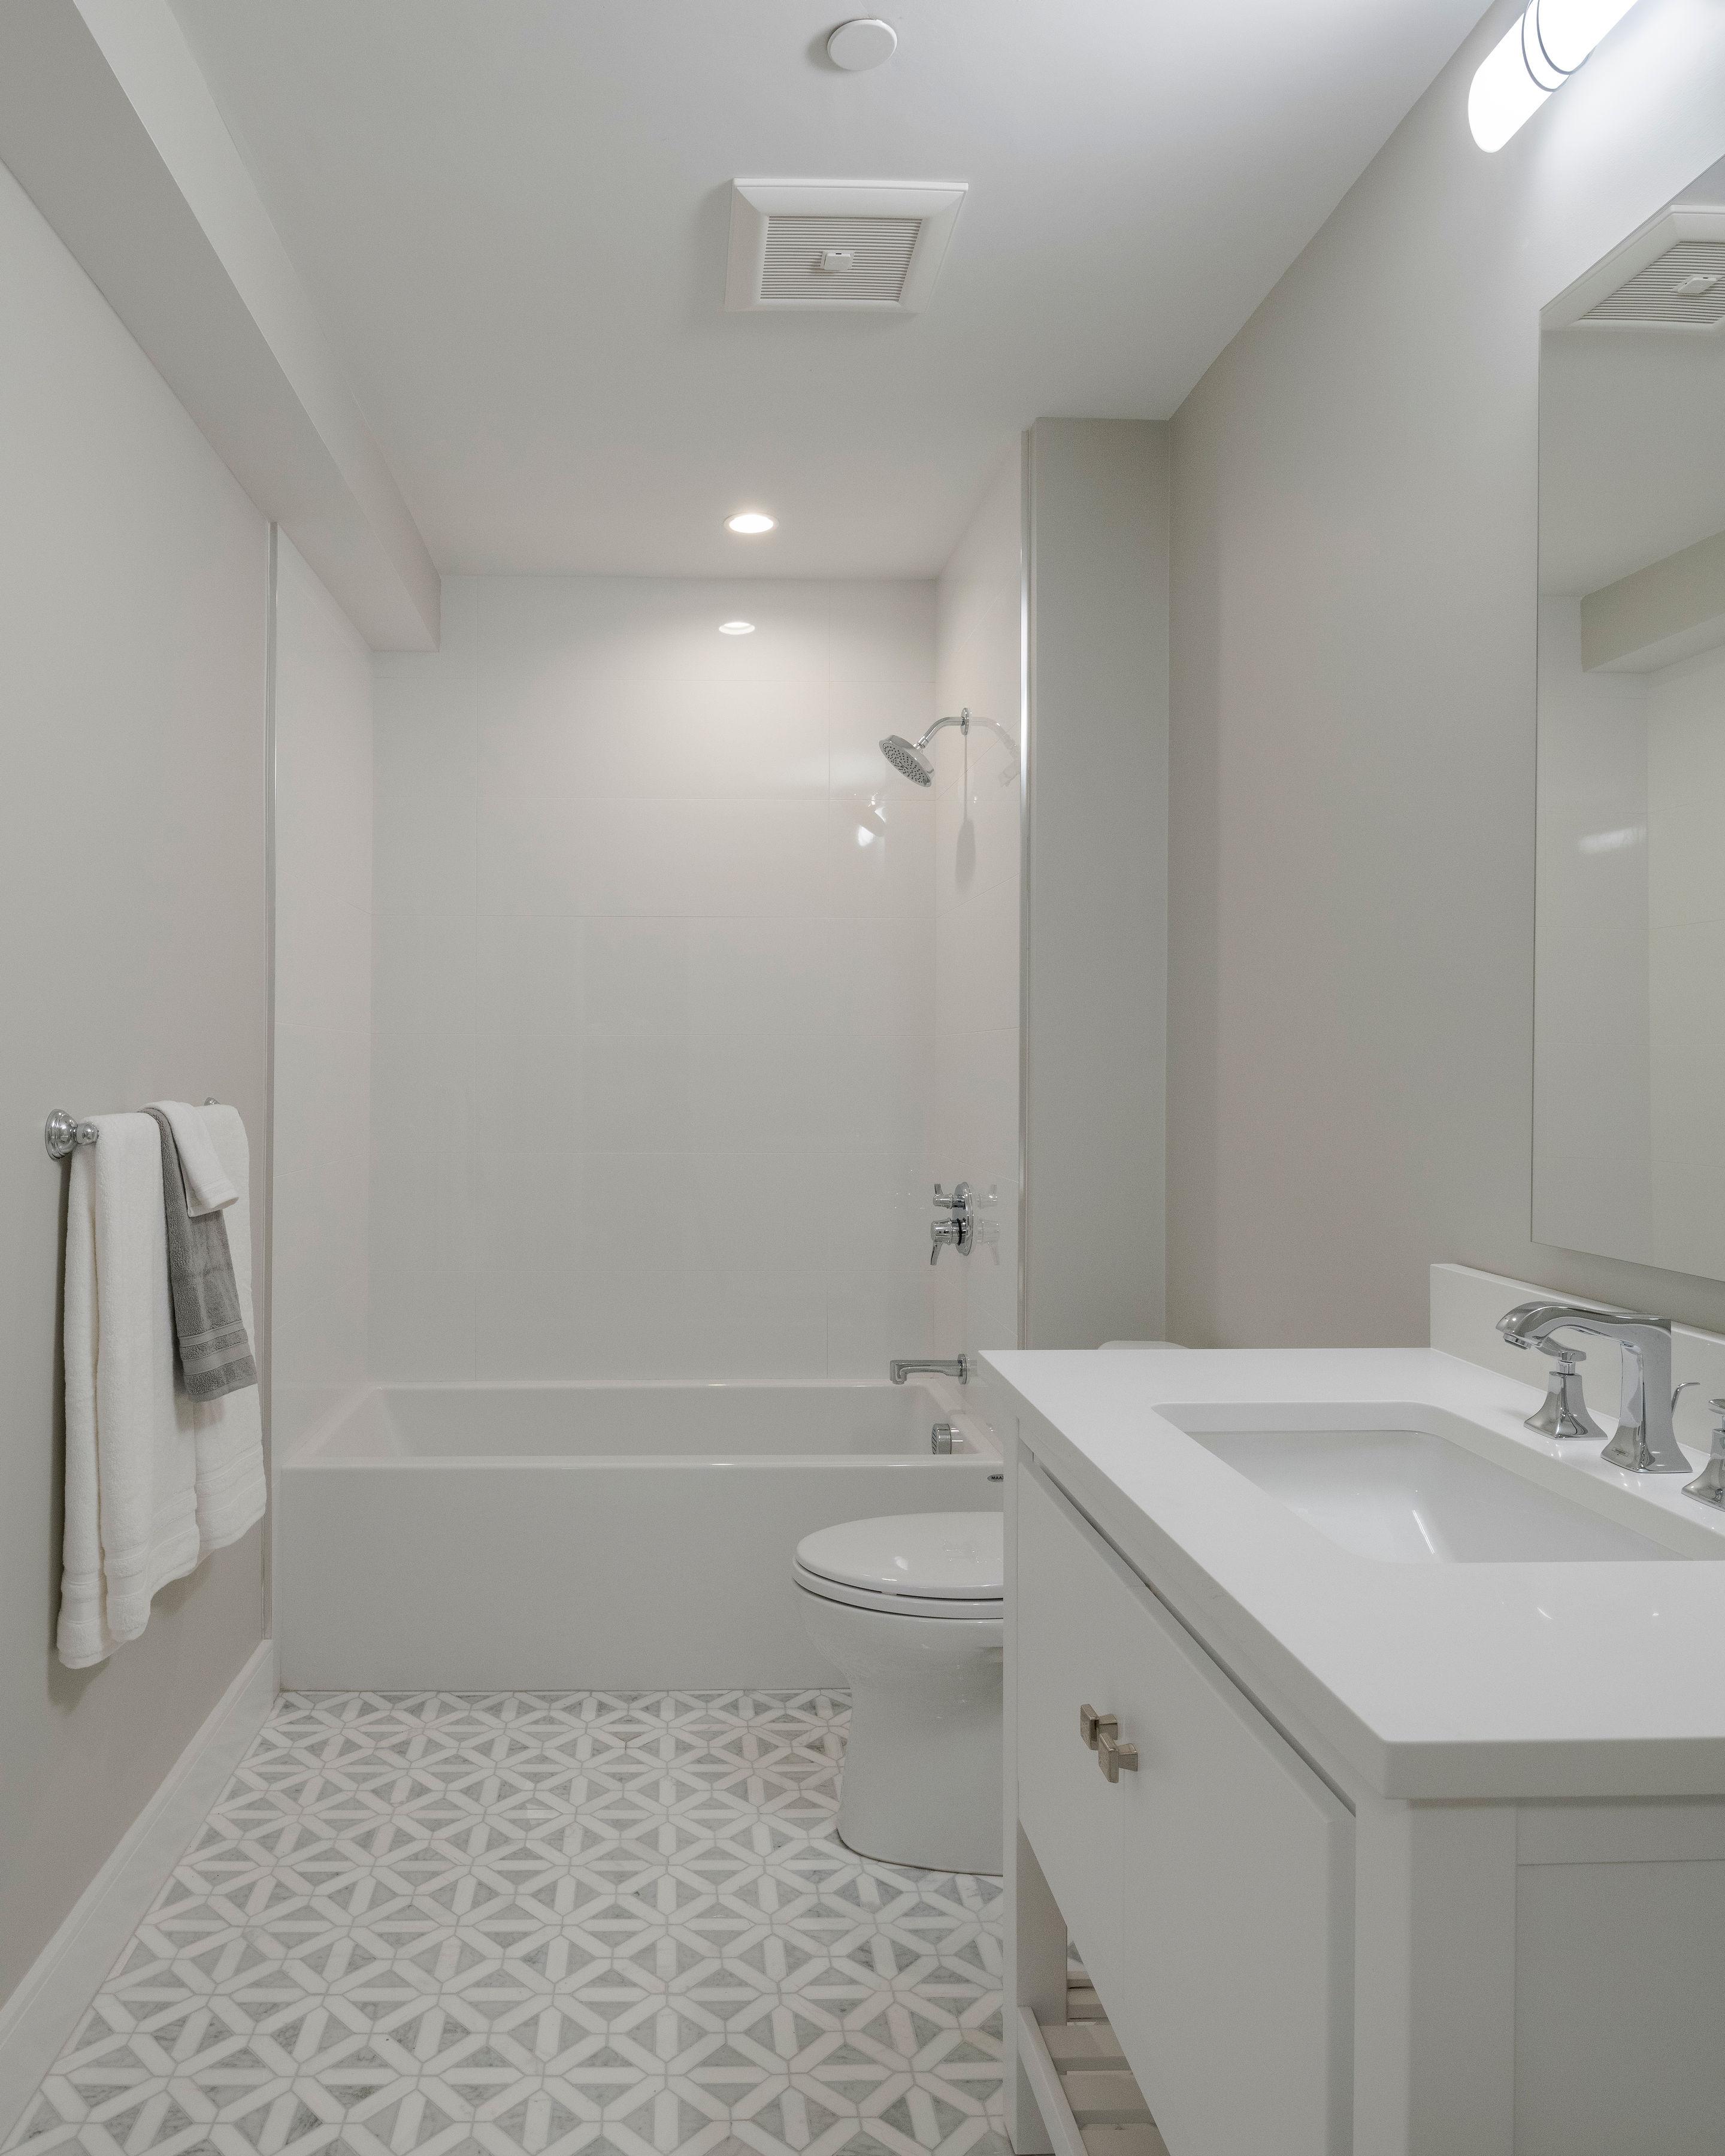 59 Auburn St. 2nd bath